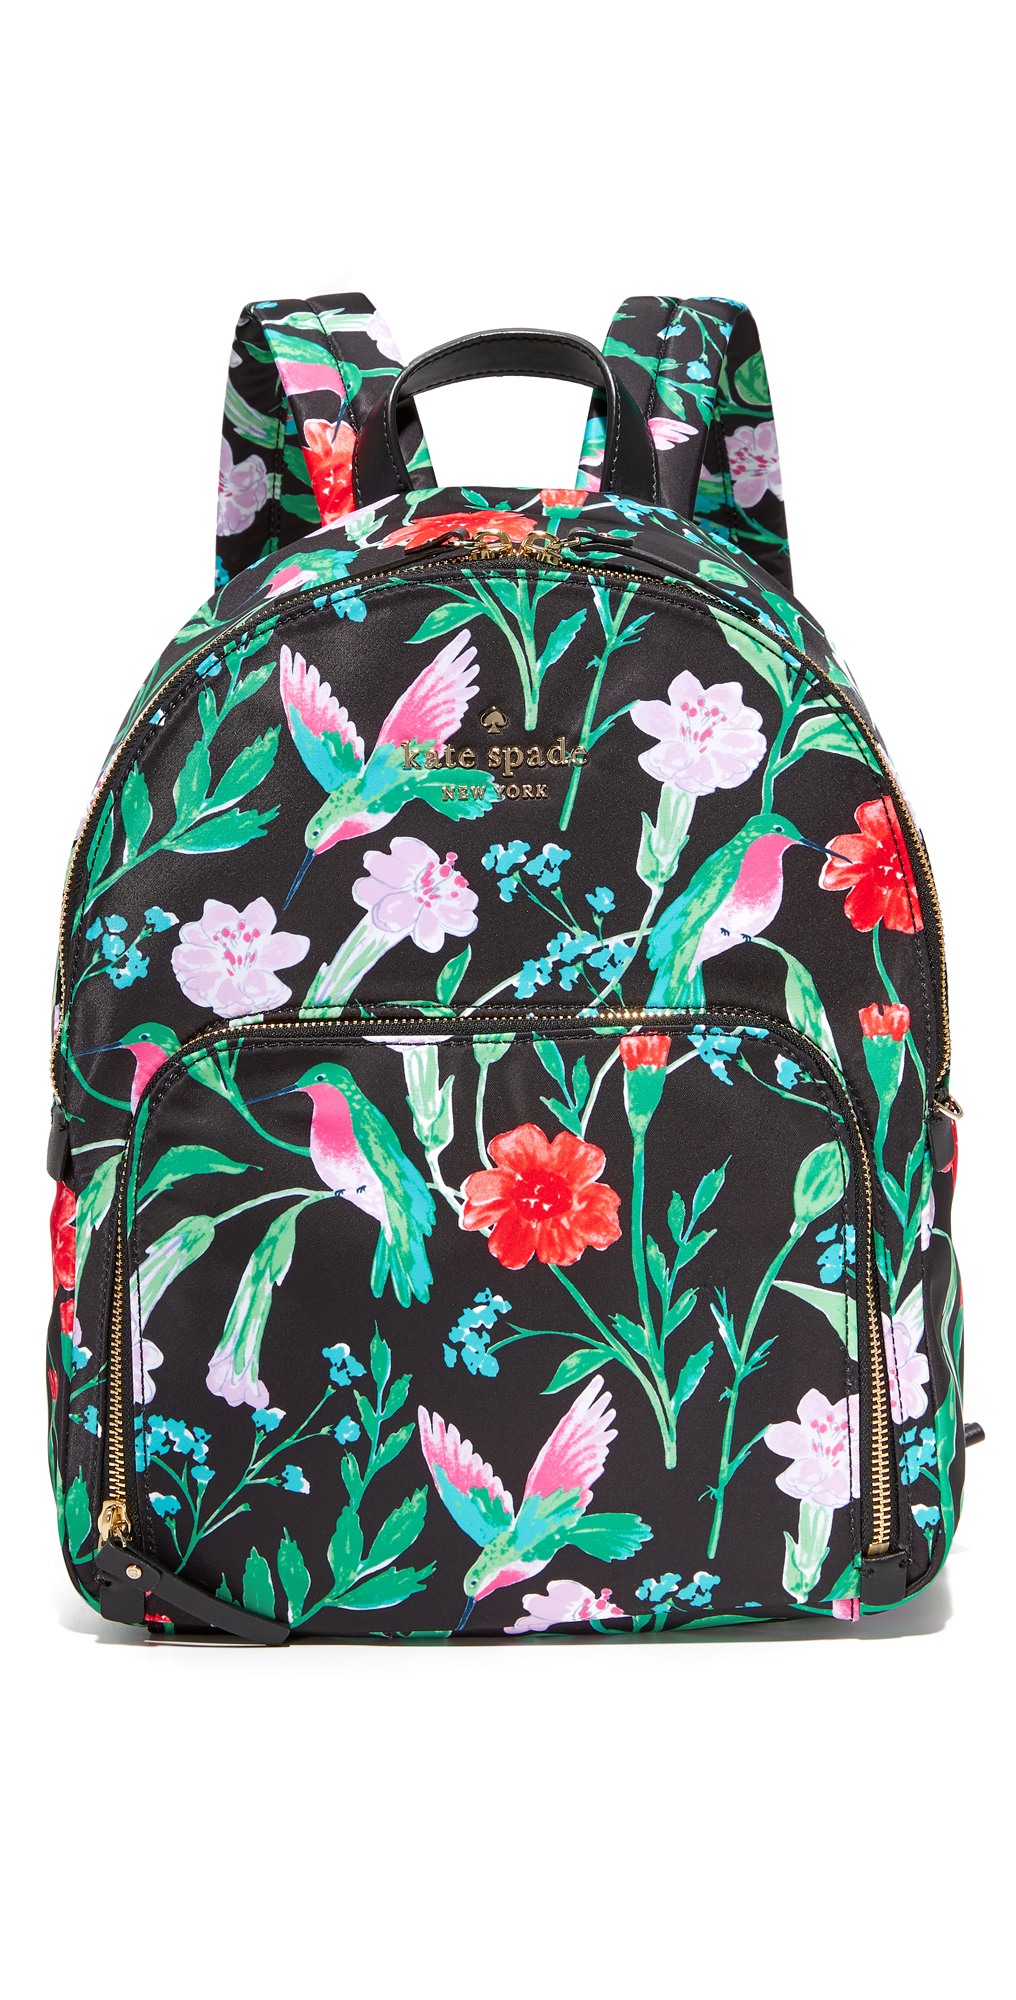 Hartley Backpack Kate Spade New York